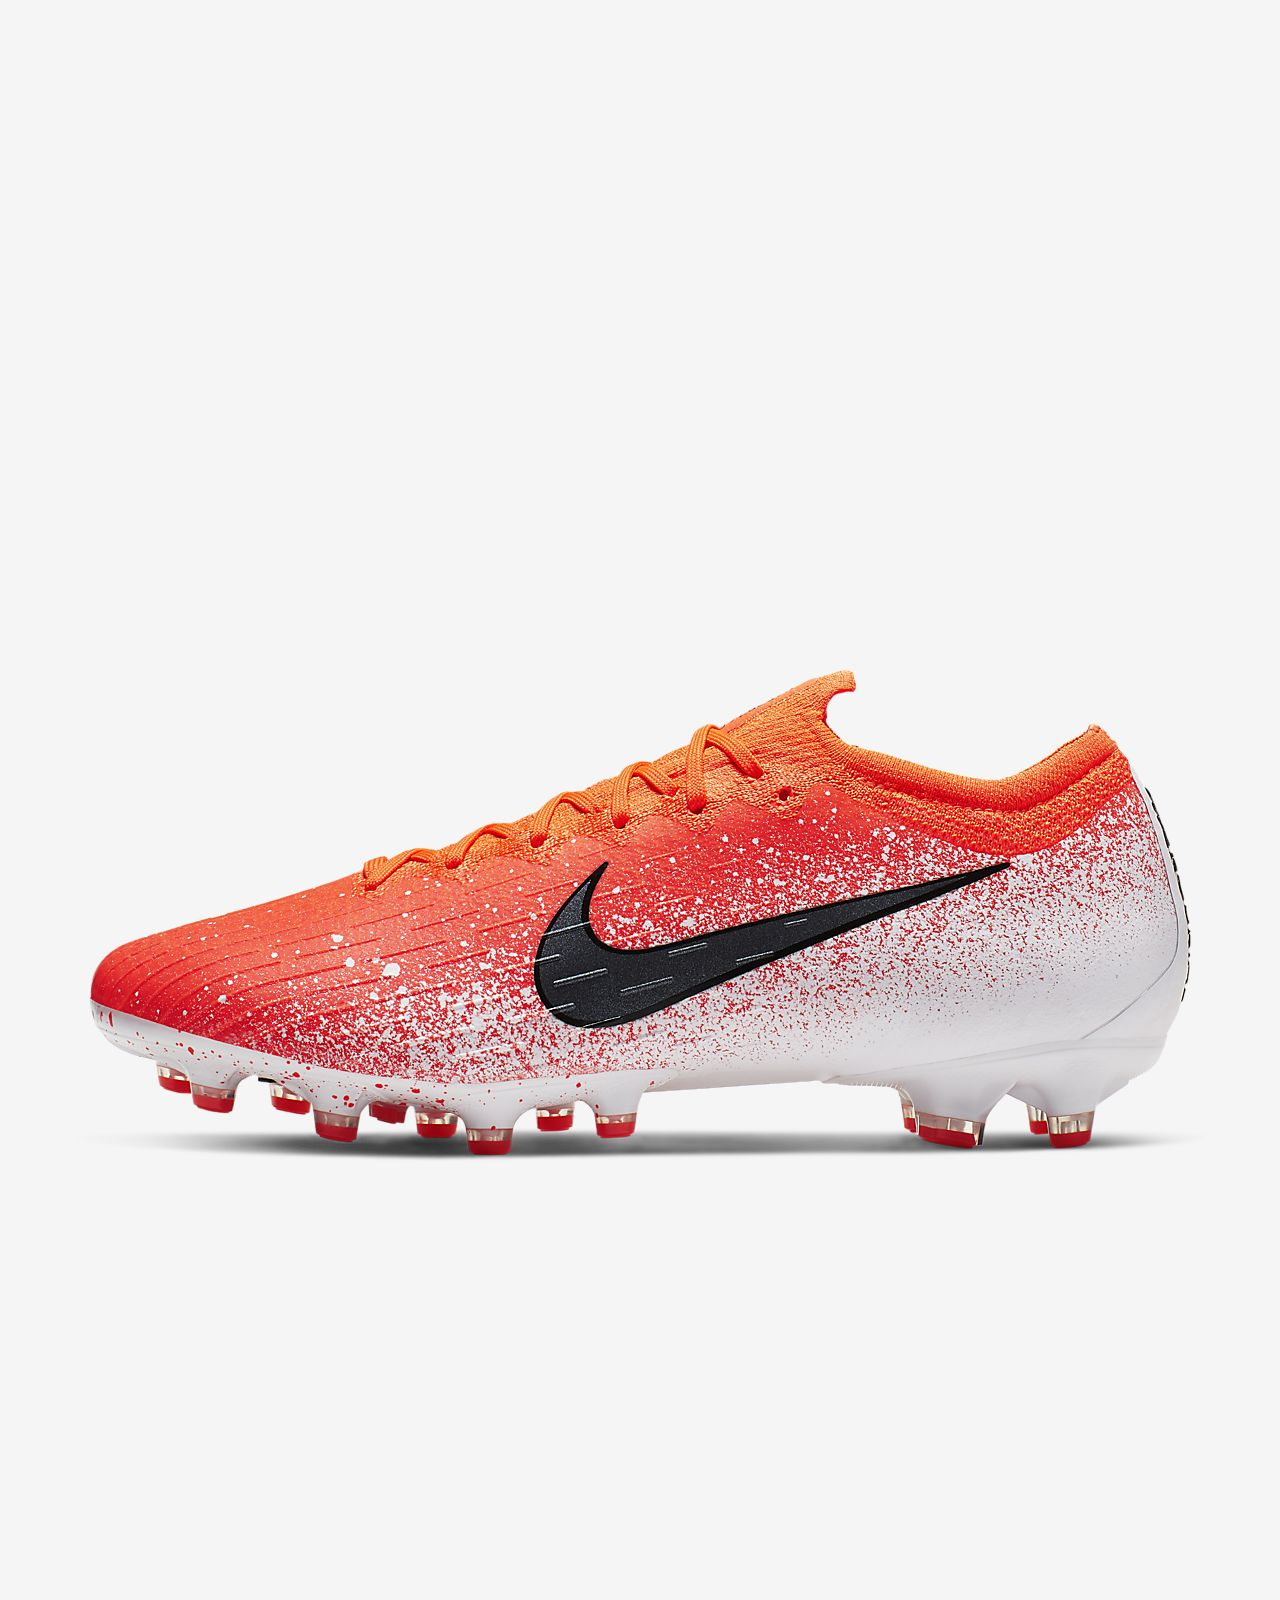 b17f79c04 ... Nike Mercurial Vapor 360 Elite AG-PRO Botas de fútbol para césped  artificial